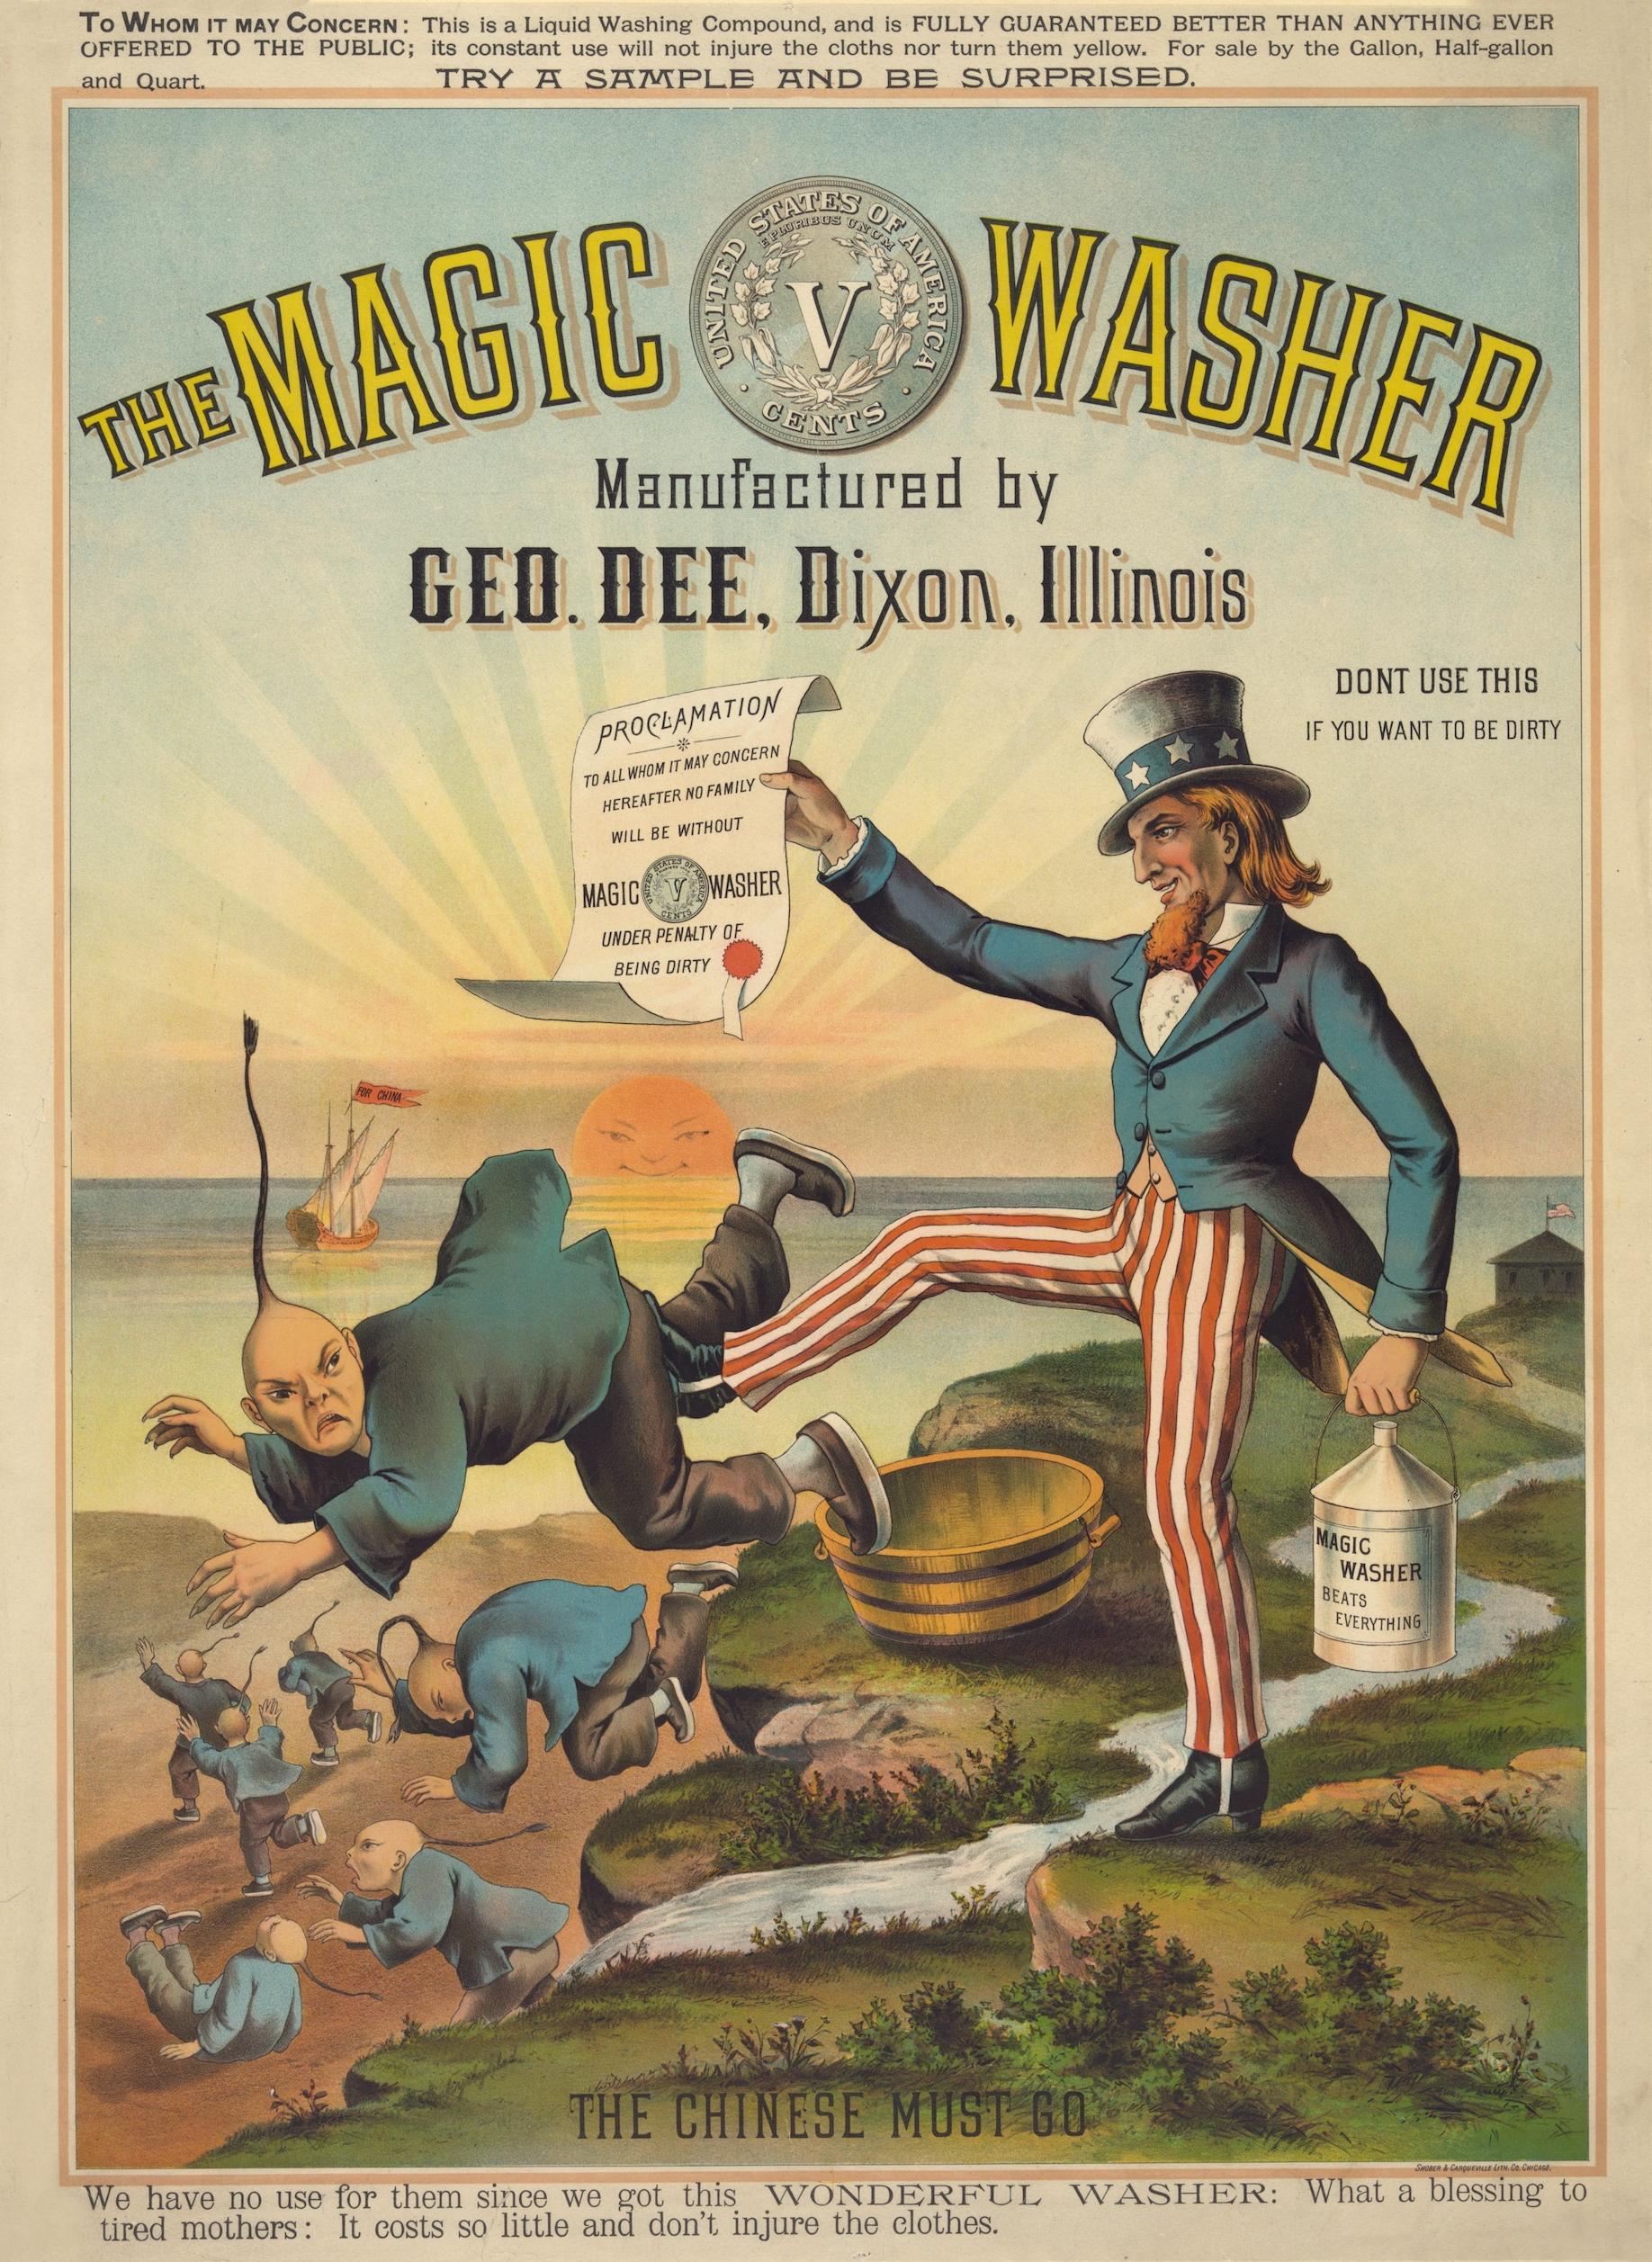 https://upload.wikimedia.org/wikipedia/commons/7/7d/The_Chinese_Must_Go_-_Magic_Washer_-_1886_anti-Chinese_US_cartoon.jpg